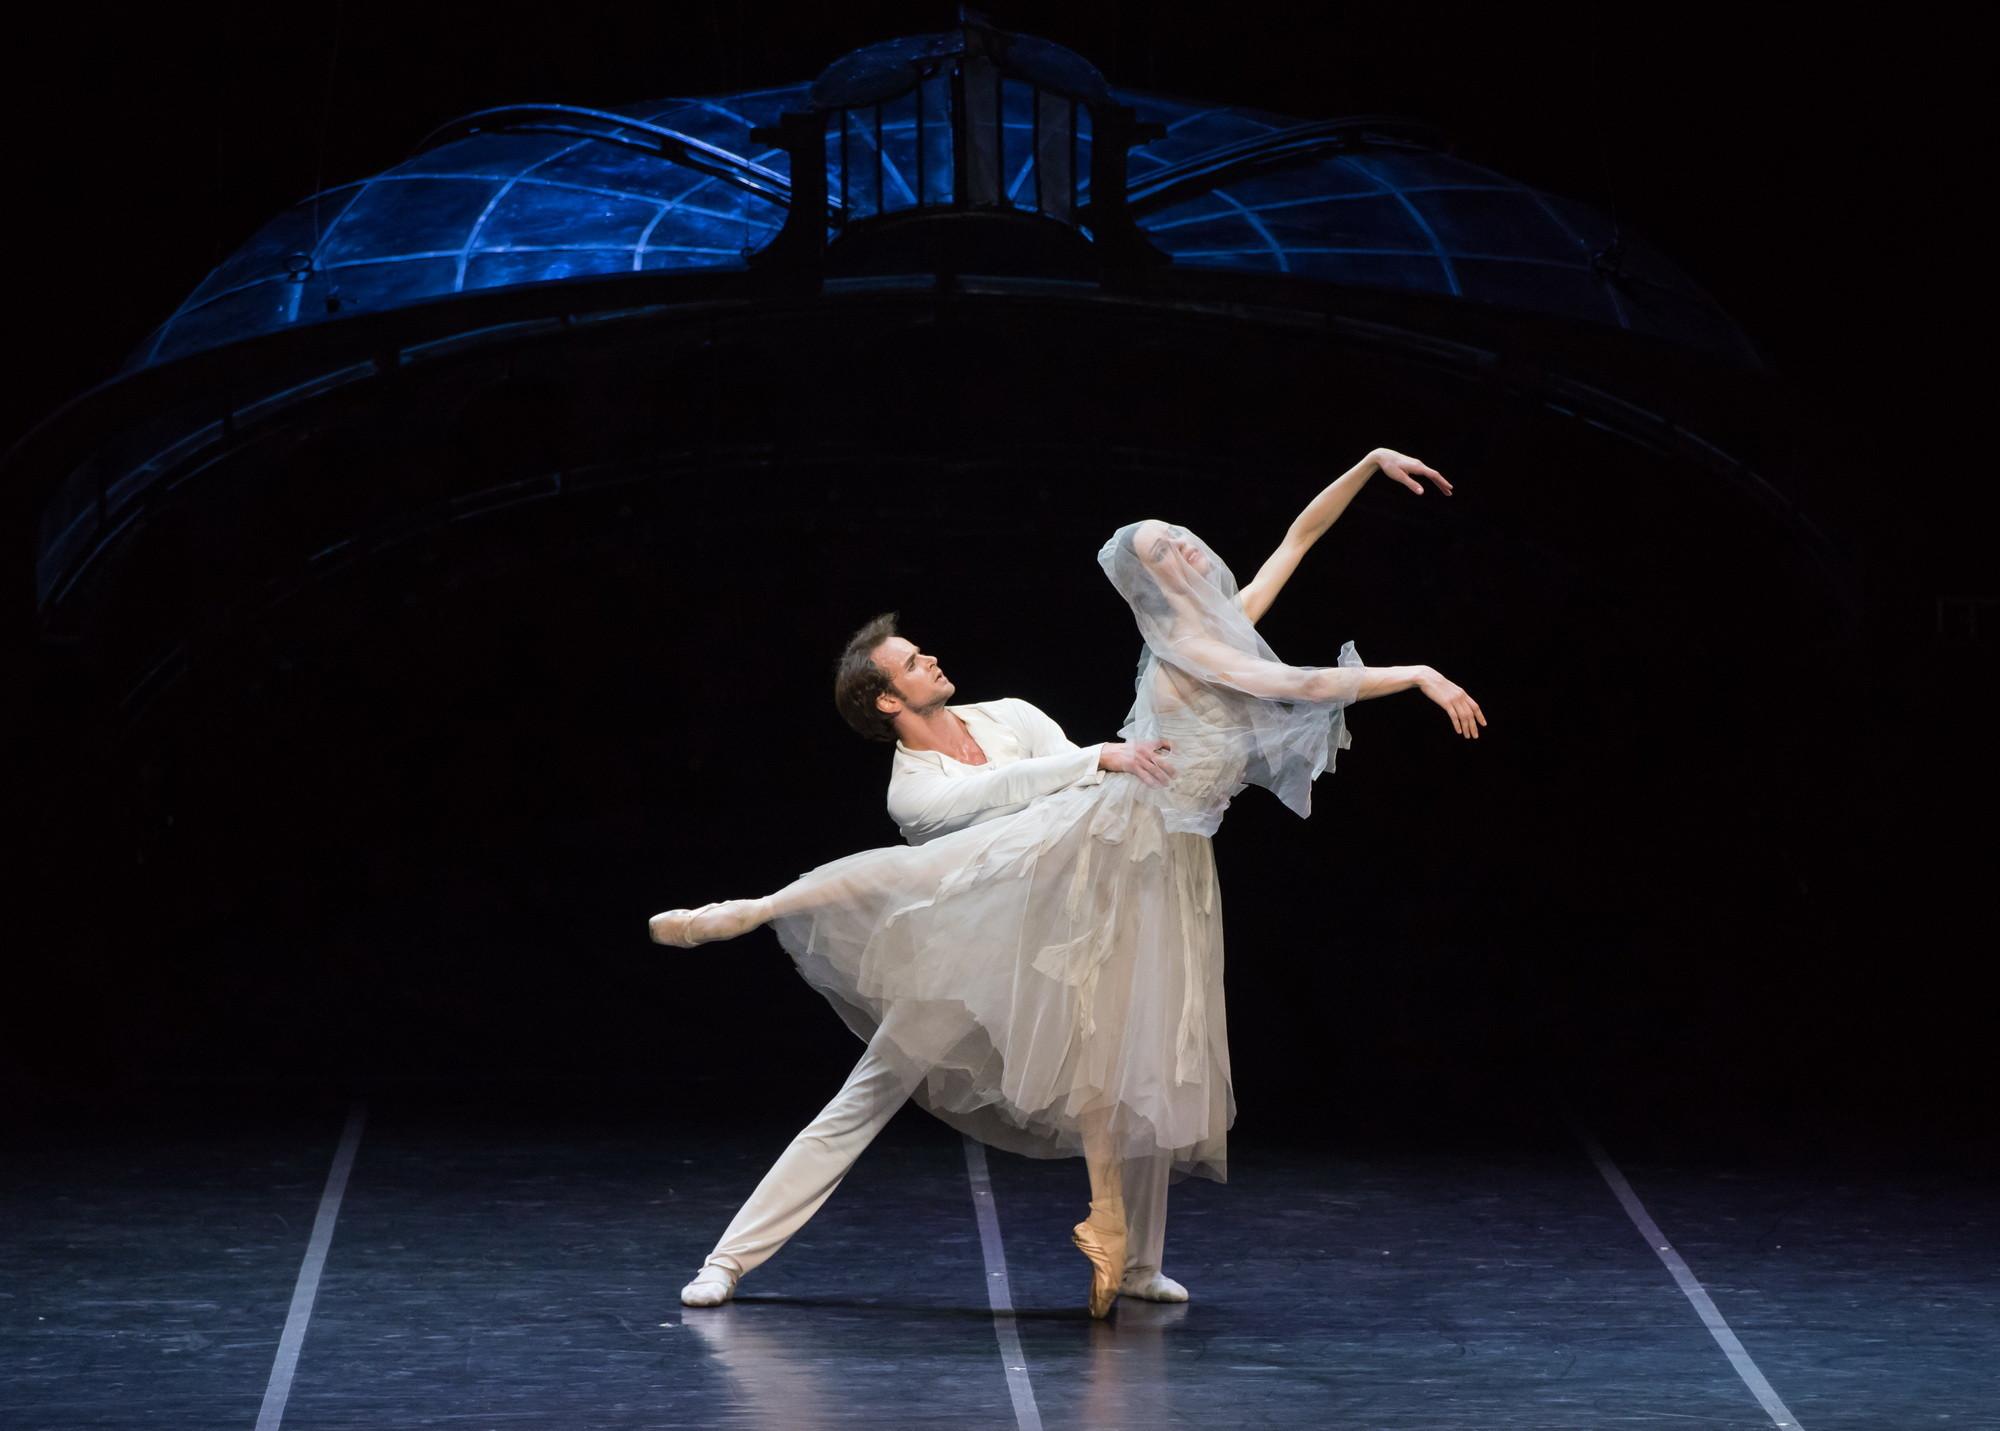 Oleg Gabyshev as Partner, unable to save Abashova's Ballerina.